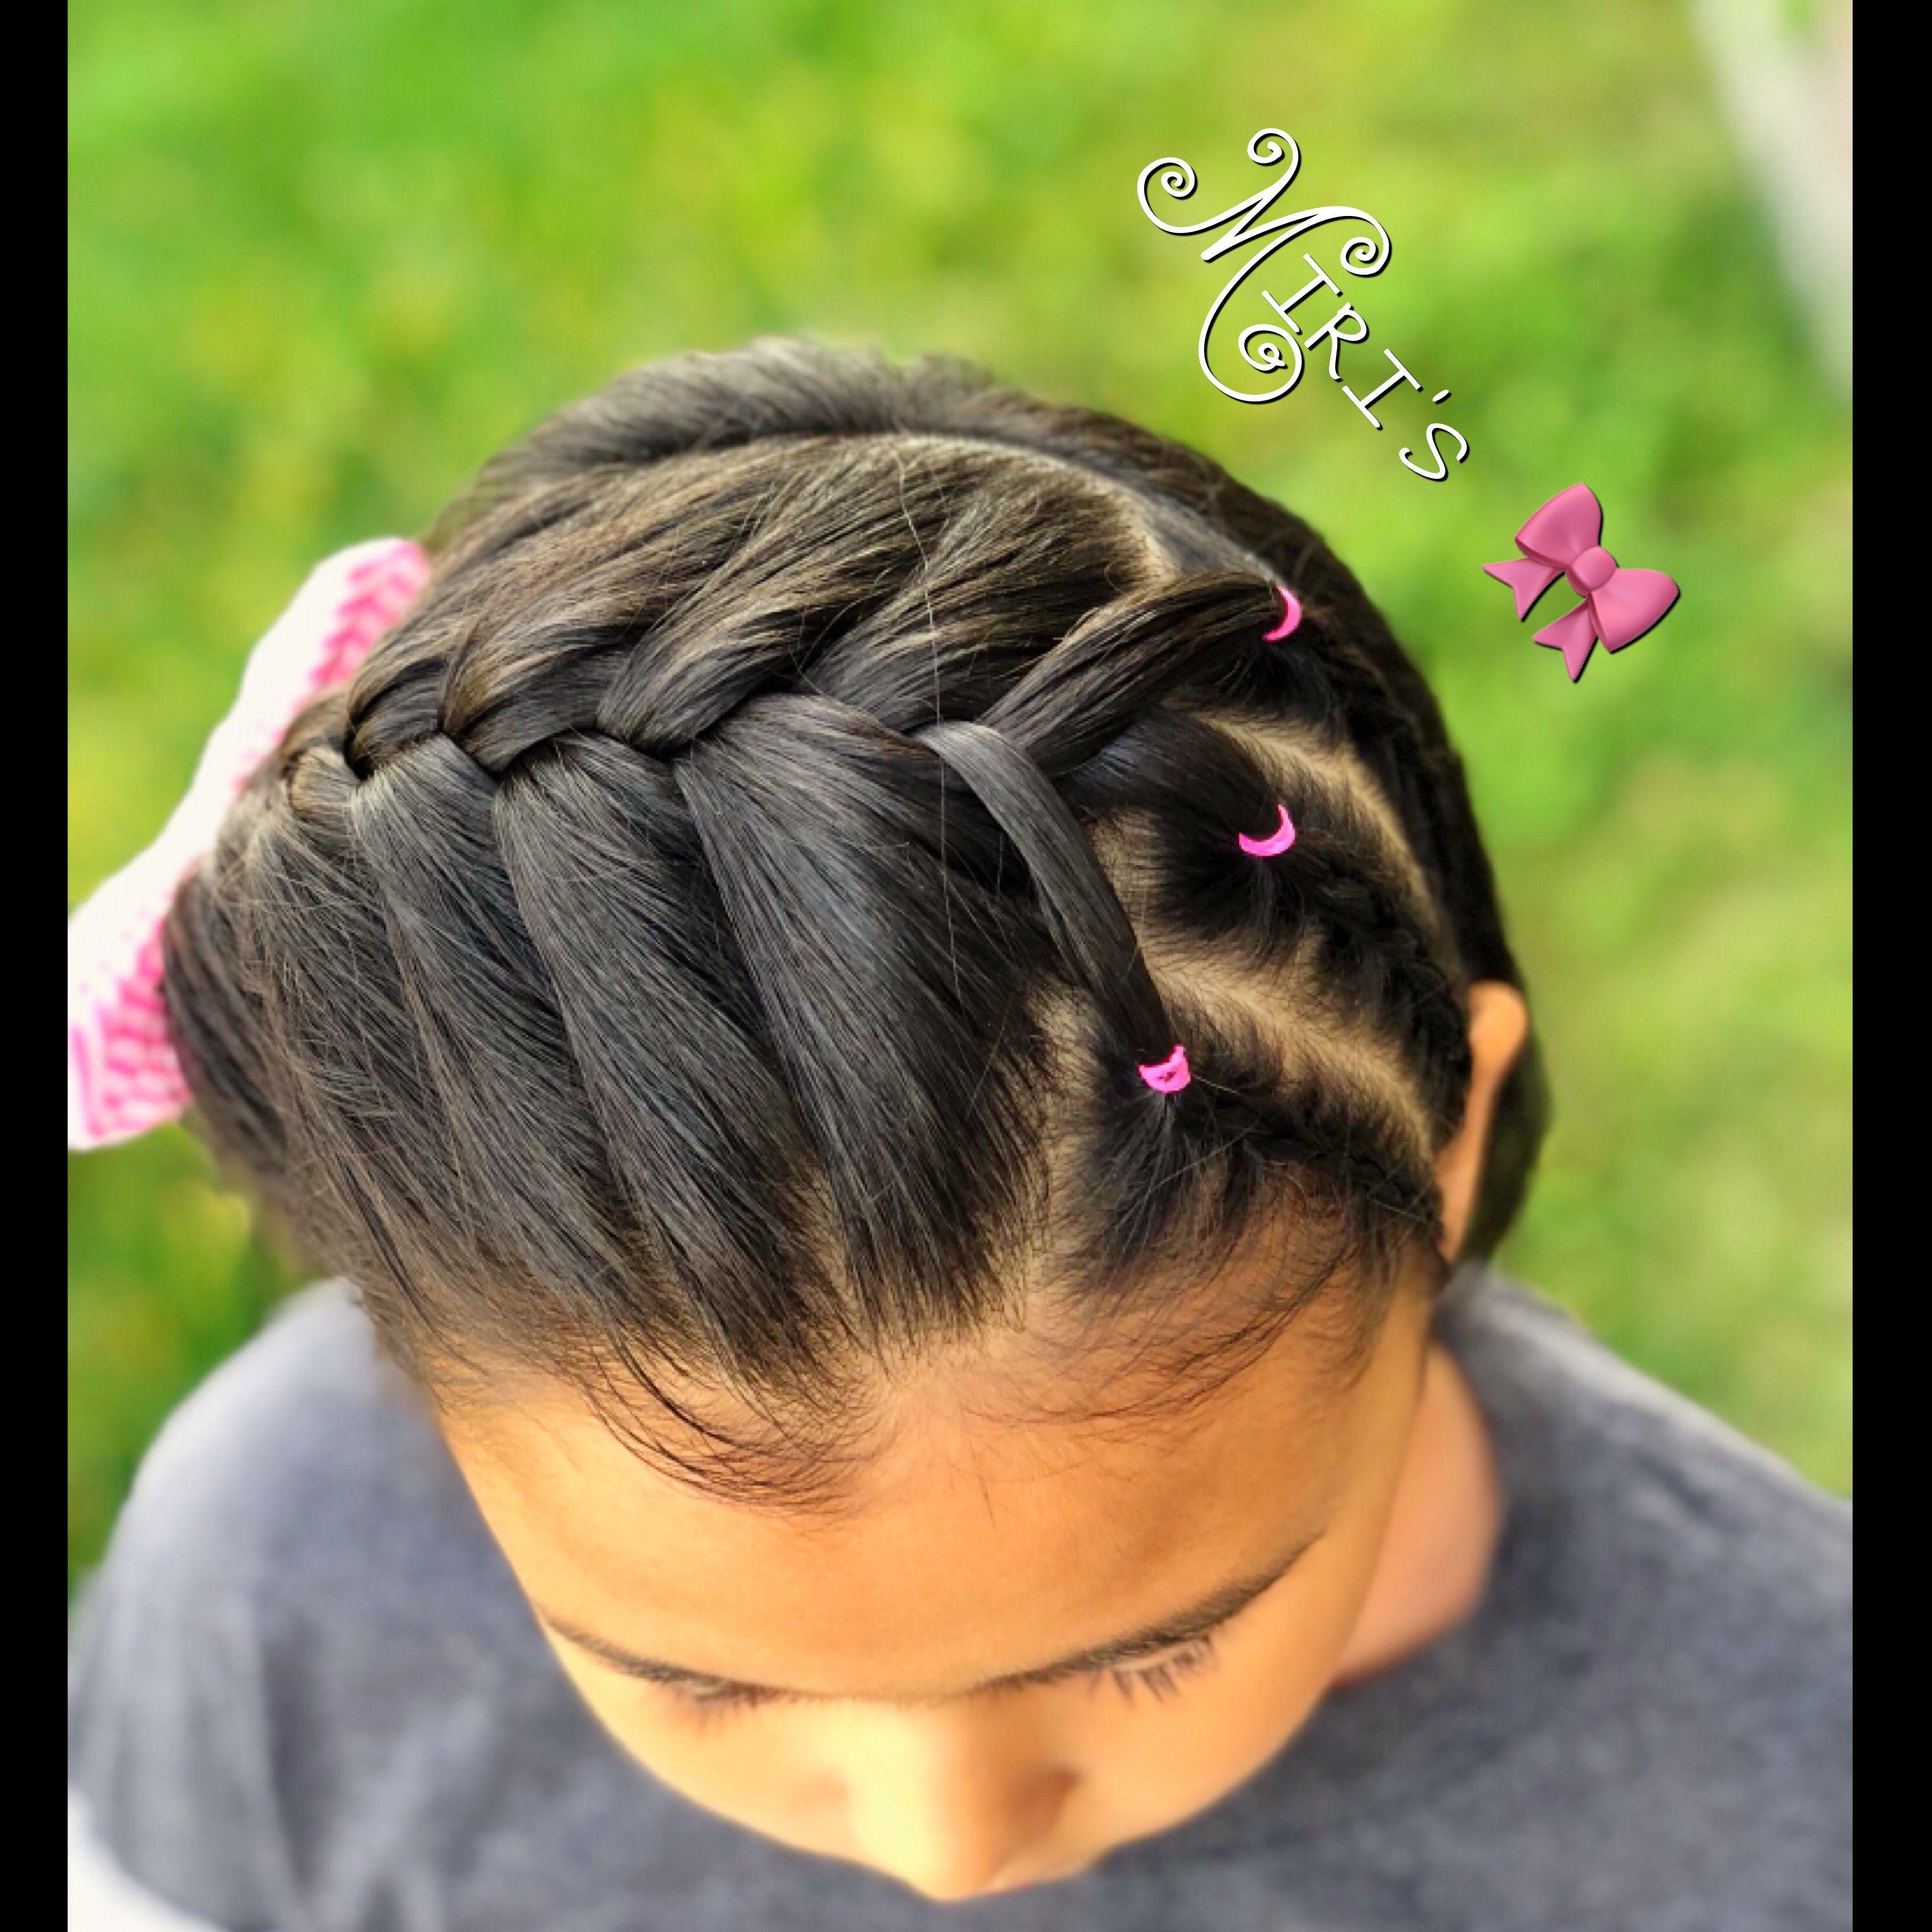 Hair style for little girls curly hairbraids pinterest hair